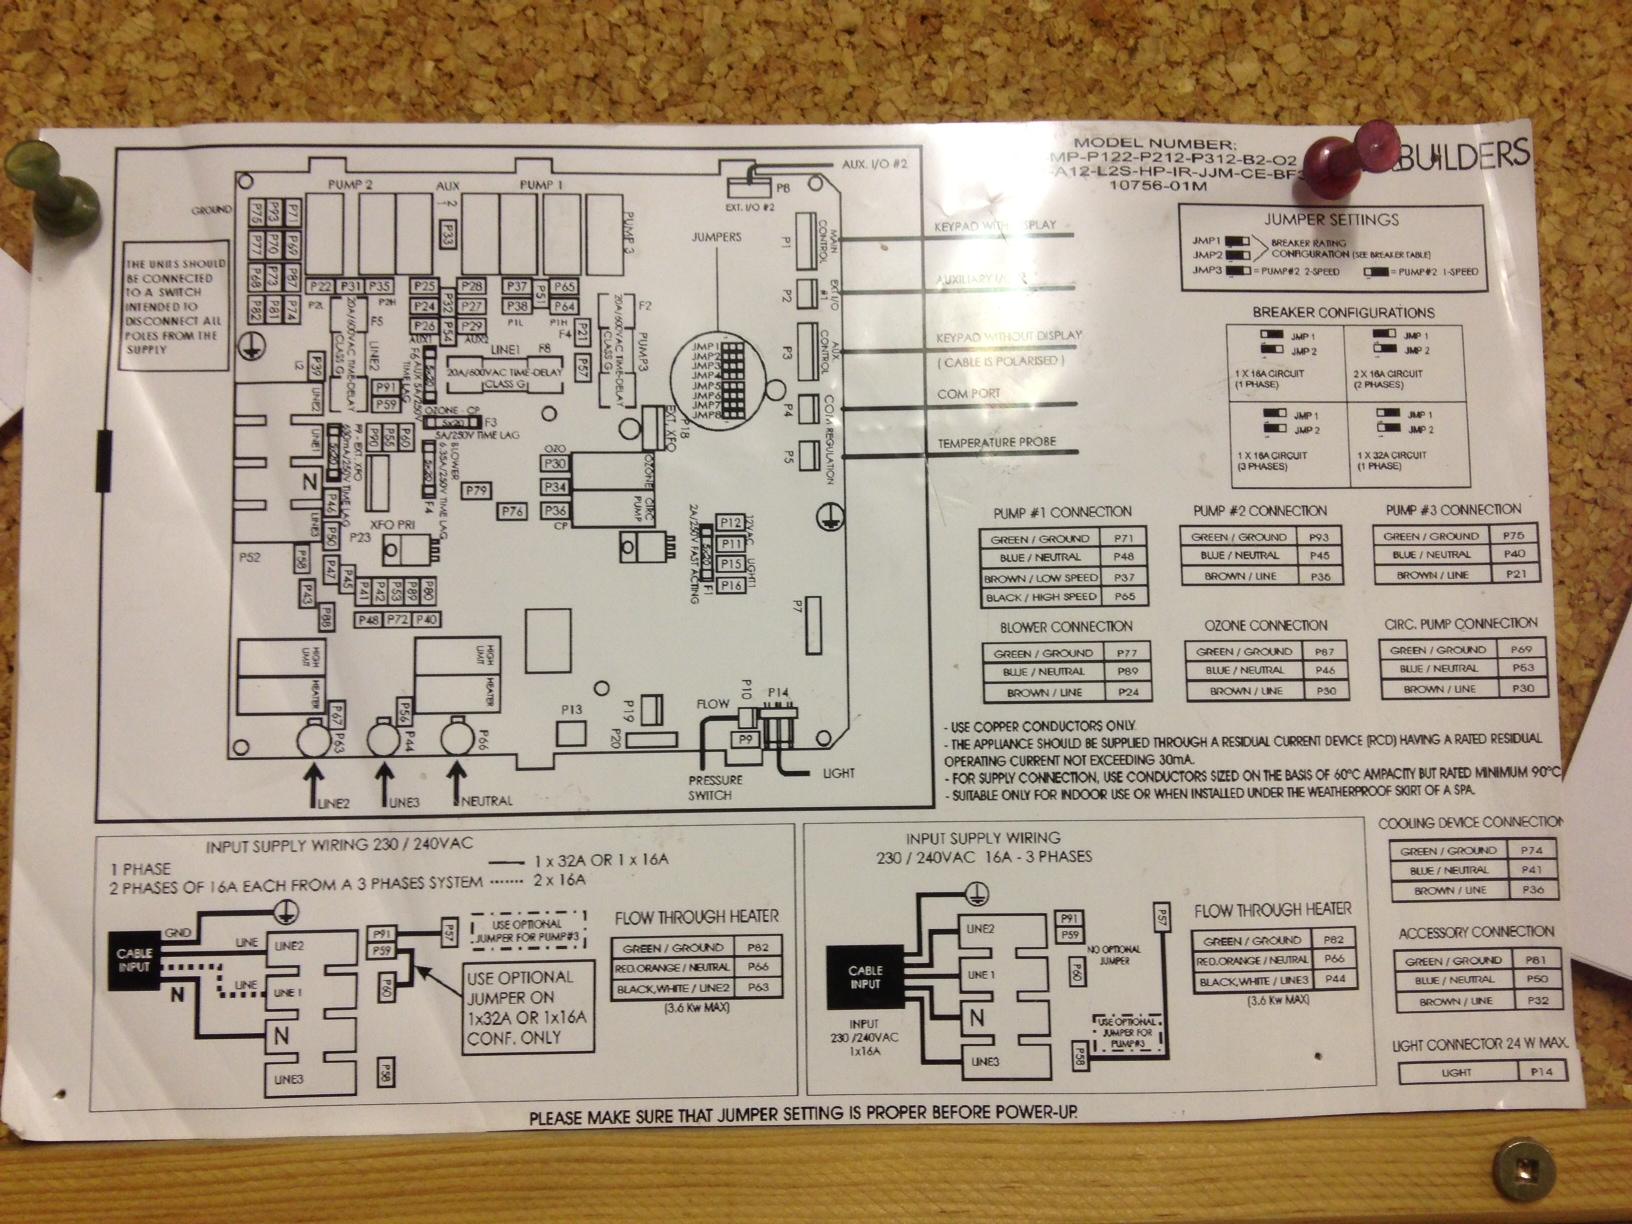 bermuda spa wiring diagram bermuda spa wiring diagram rt bali tintenglueck de  bermuda spa wiring diagram rt bali